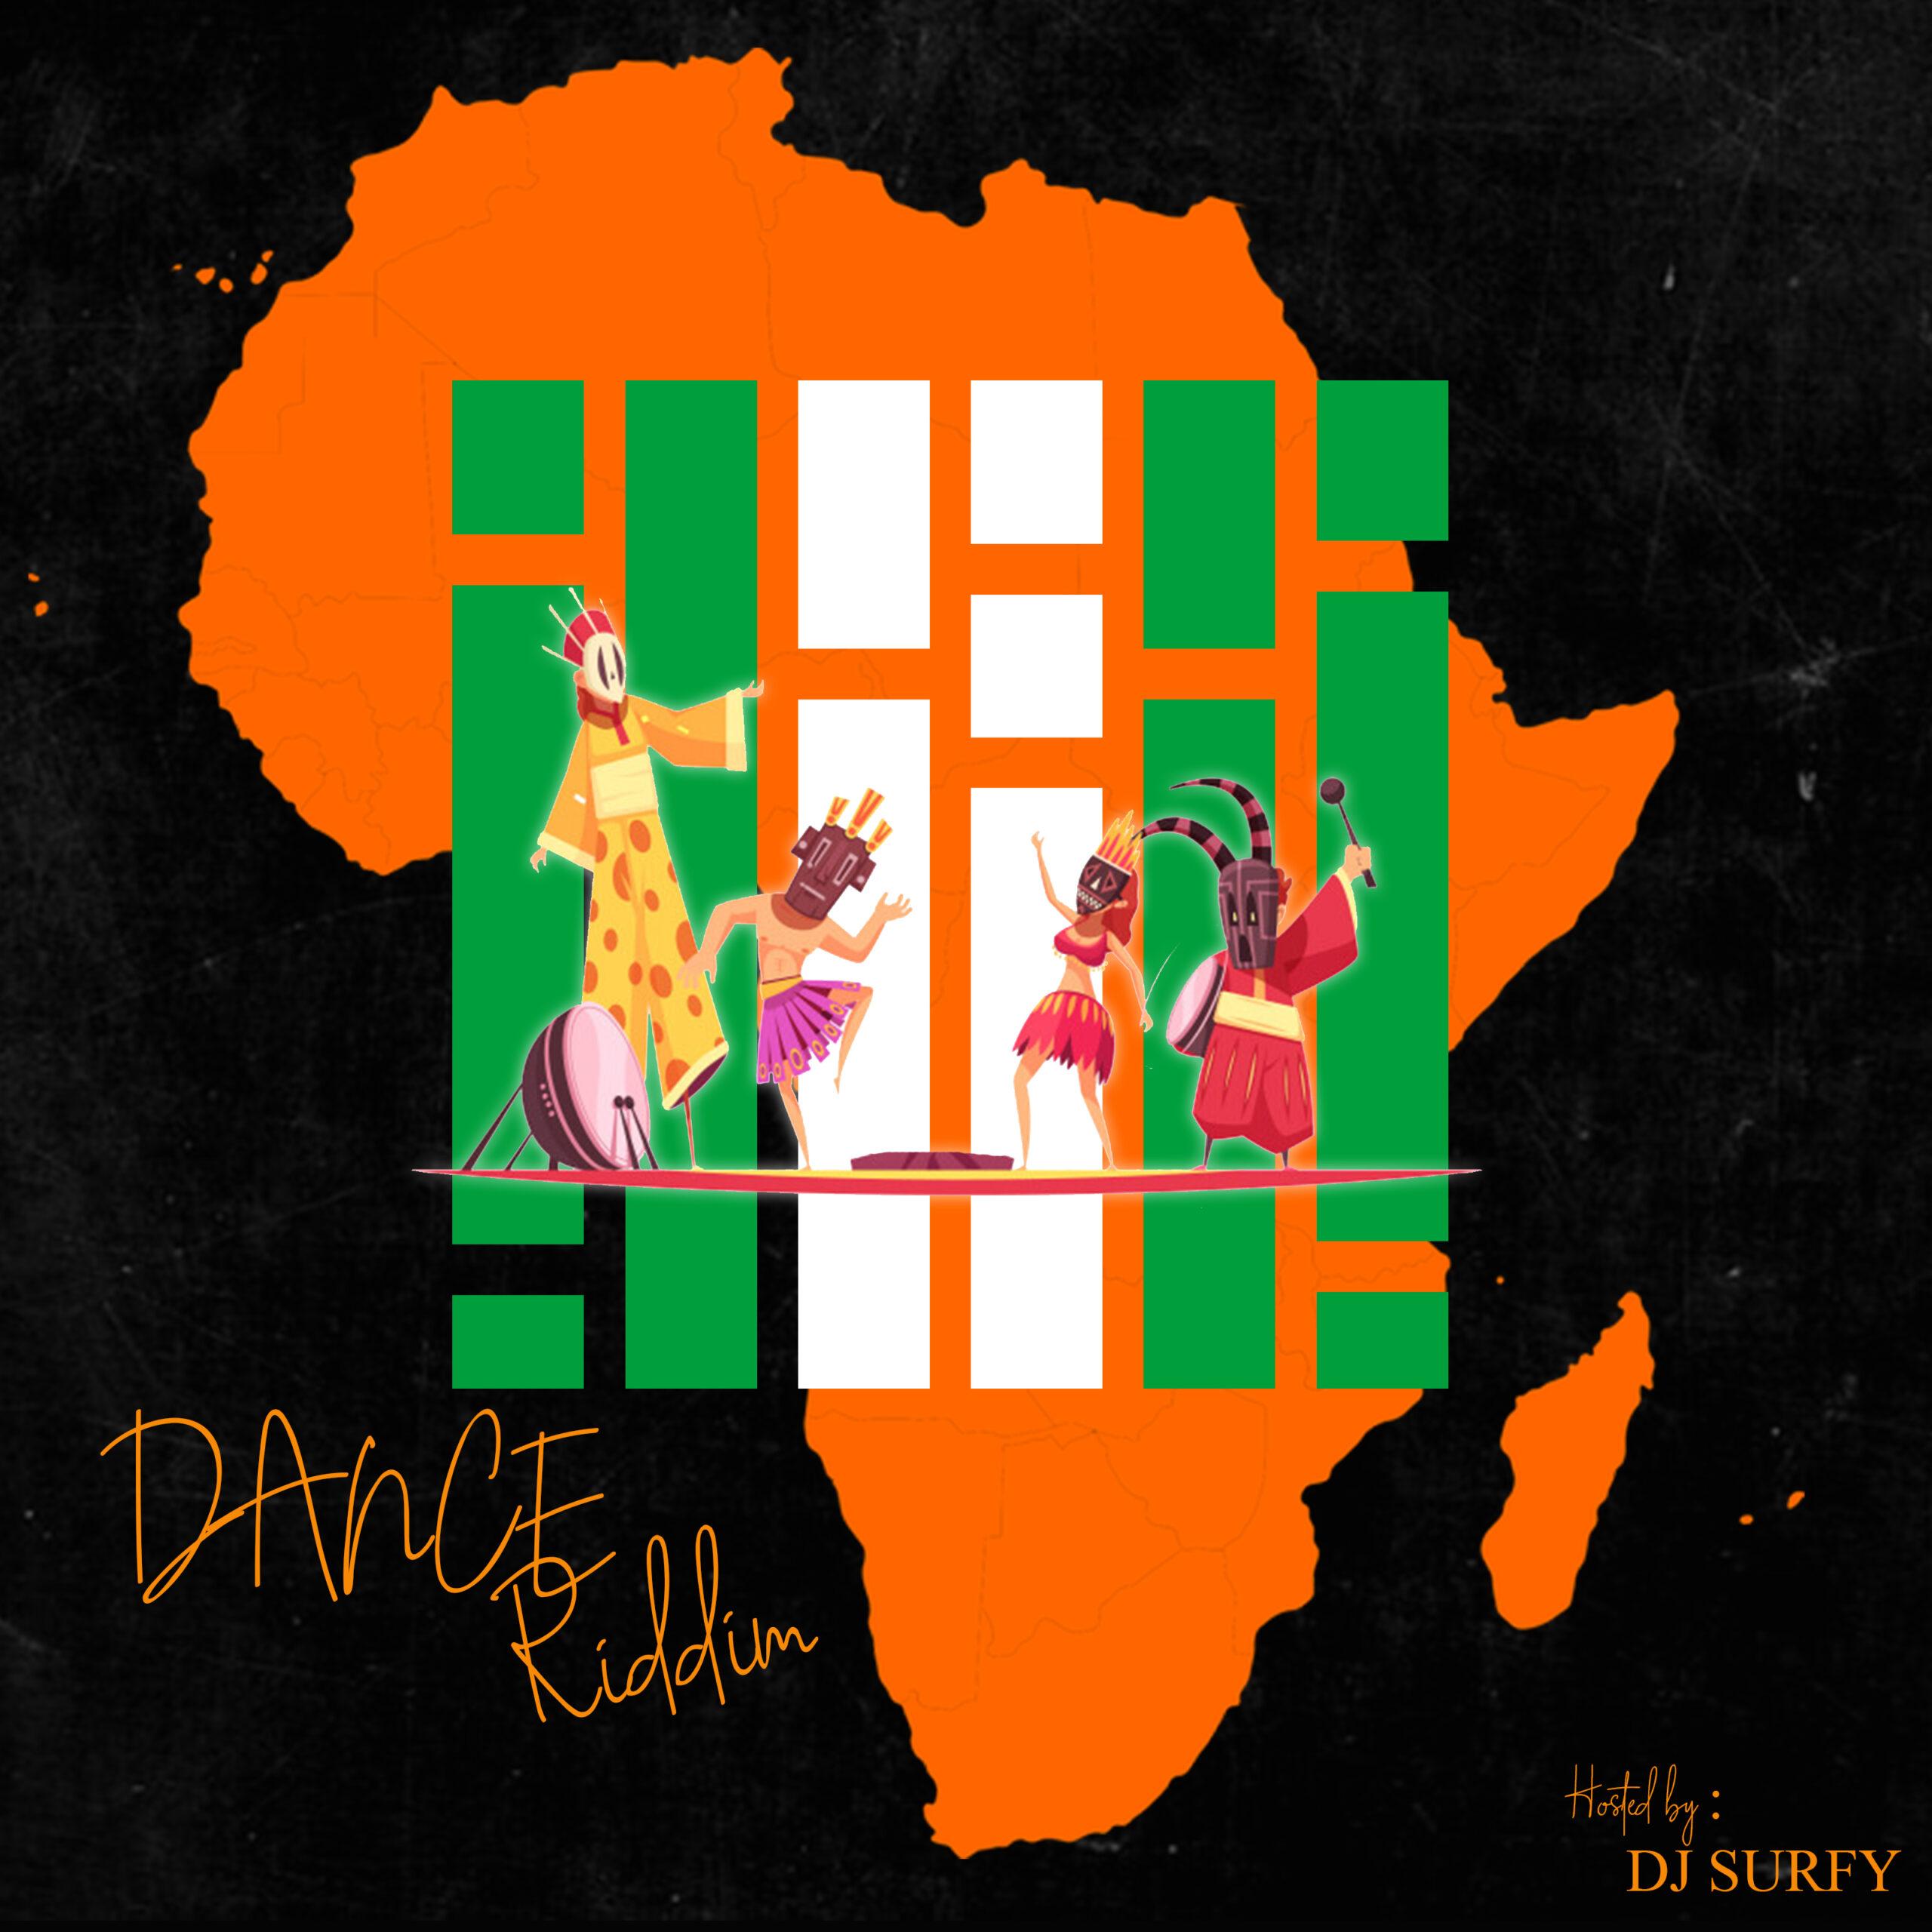 Dj Surfy - Dance Riddim Mixtape